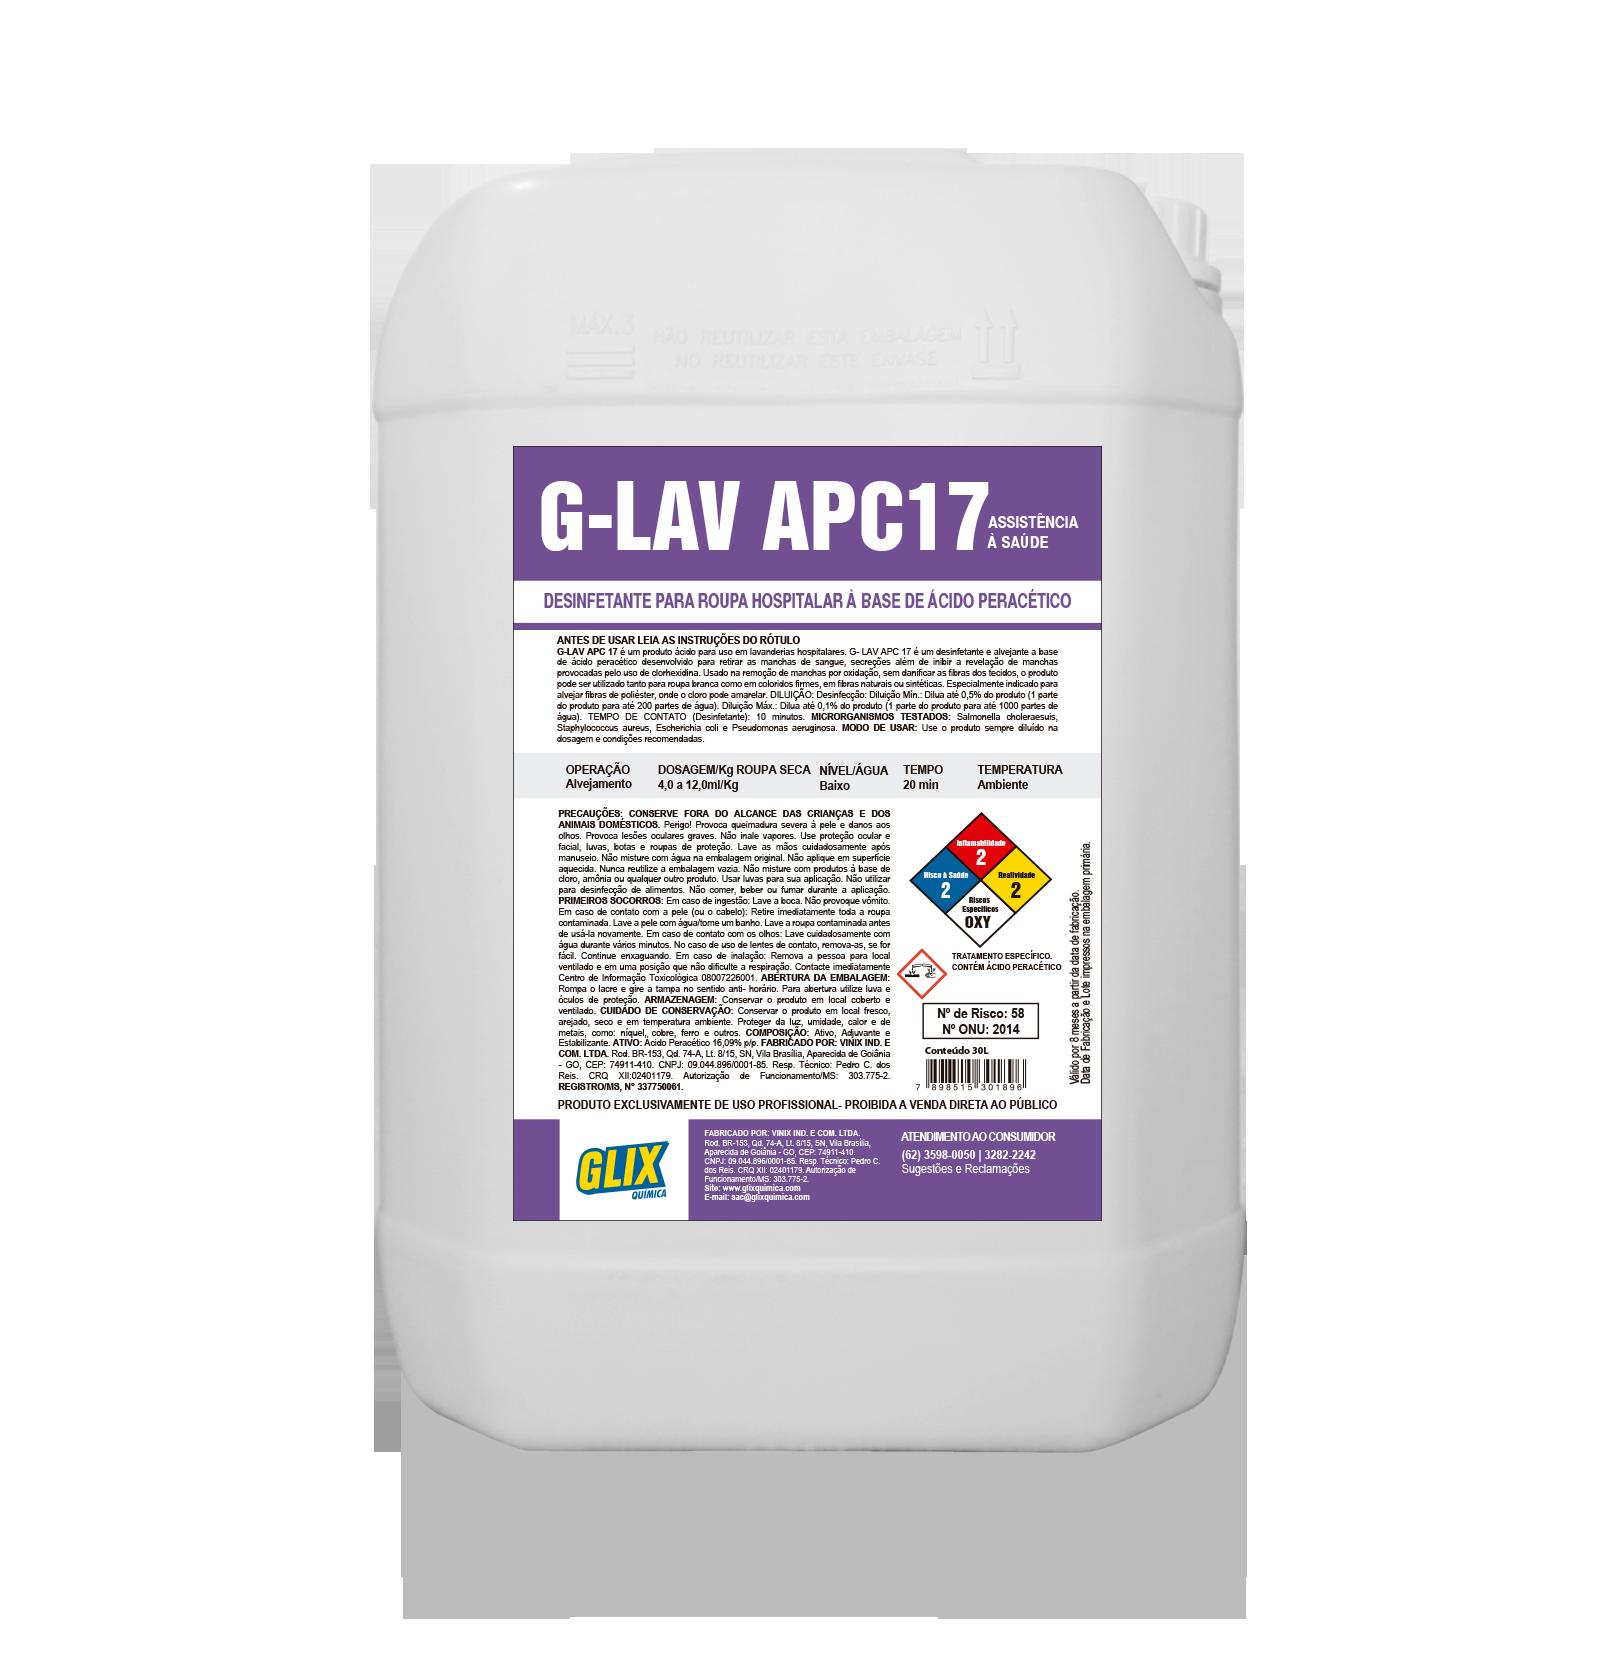 G-LAV APC 17